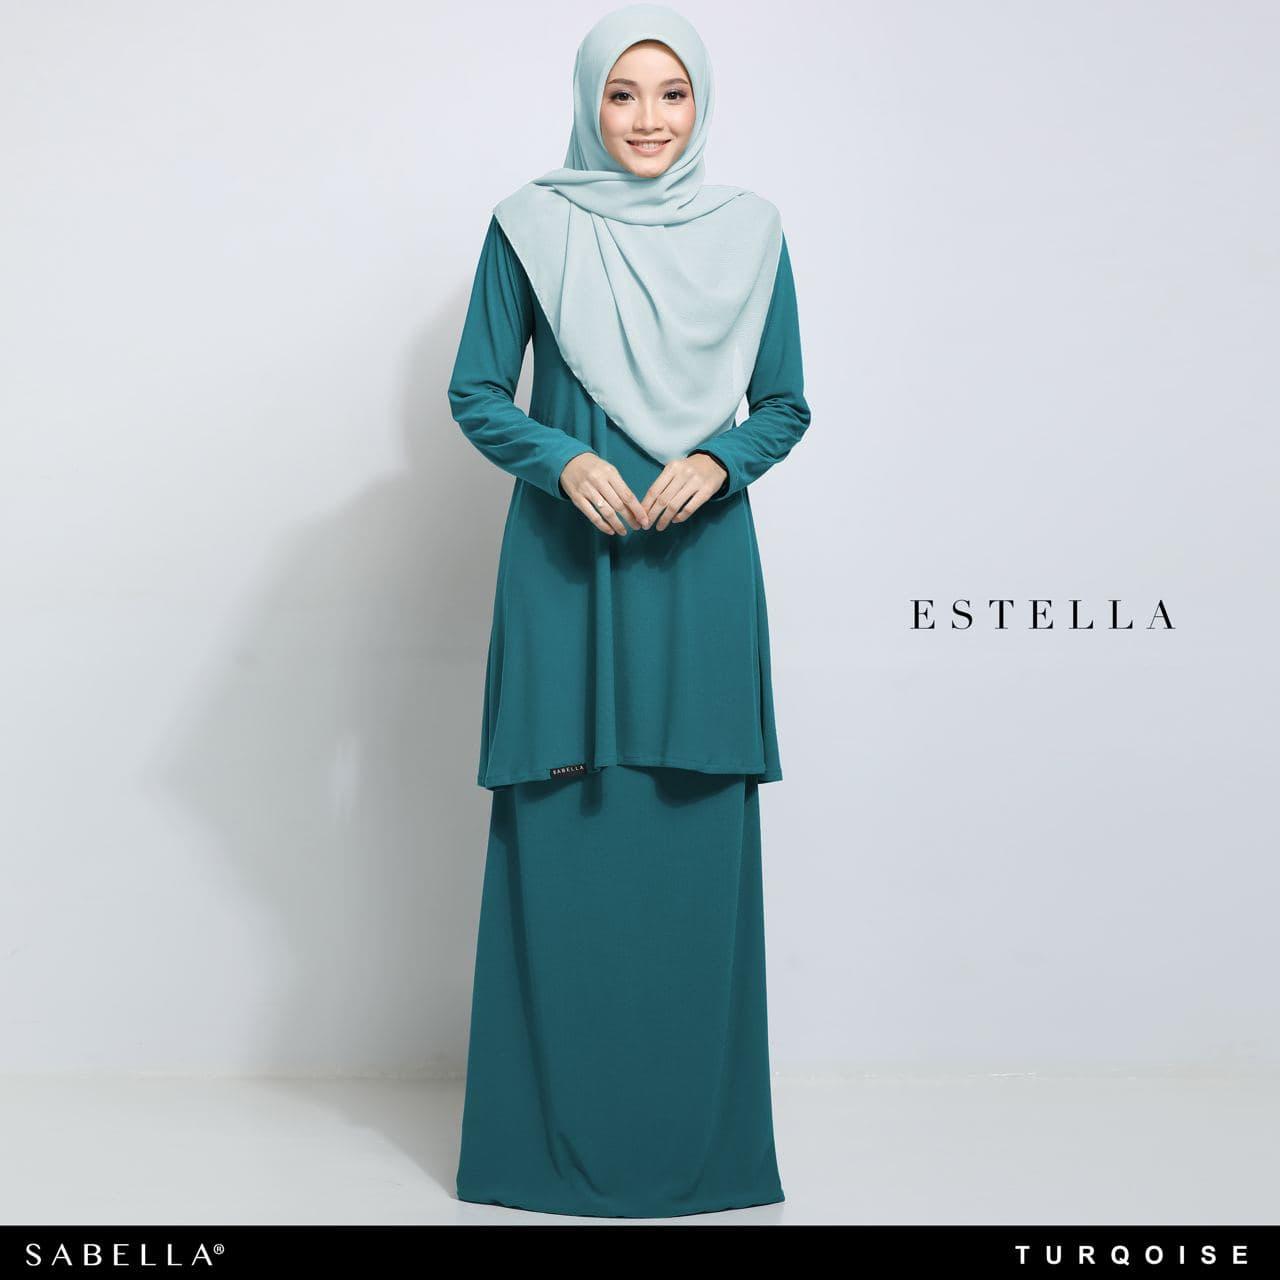 Estella 2.0 Turqoise